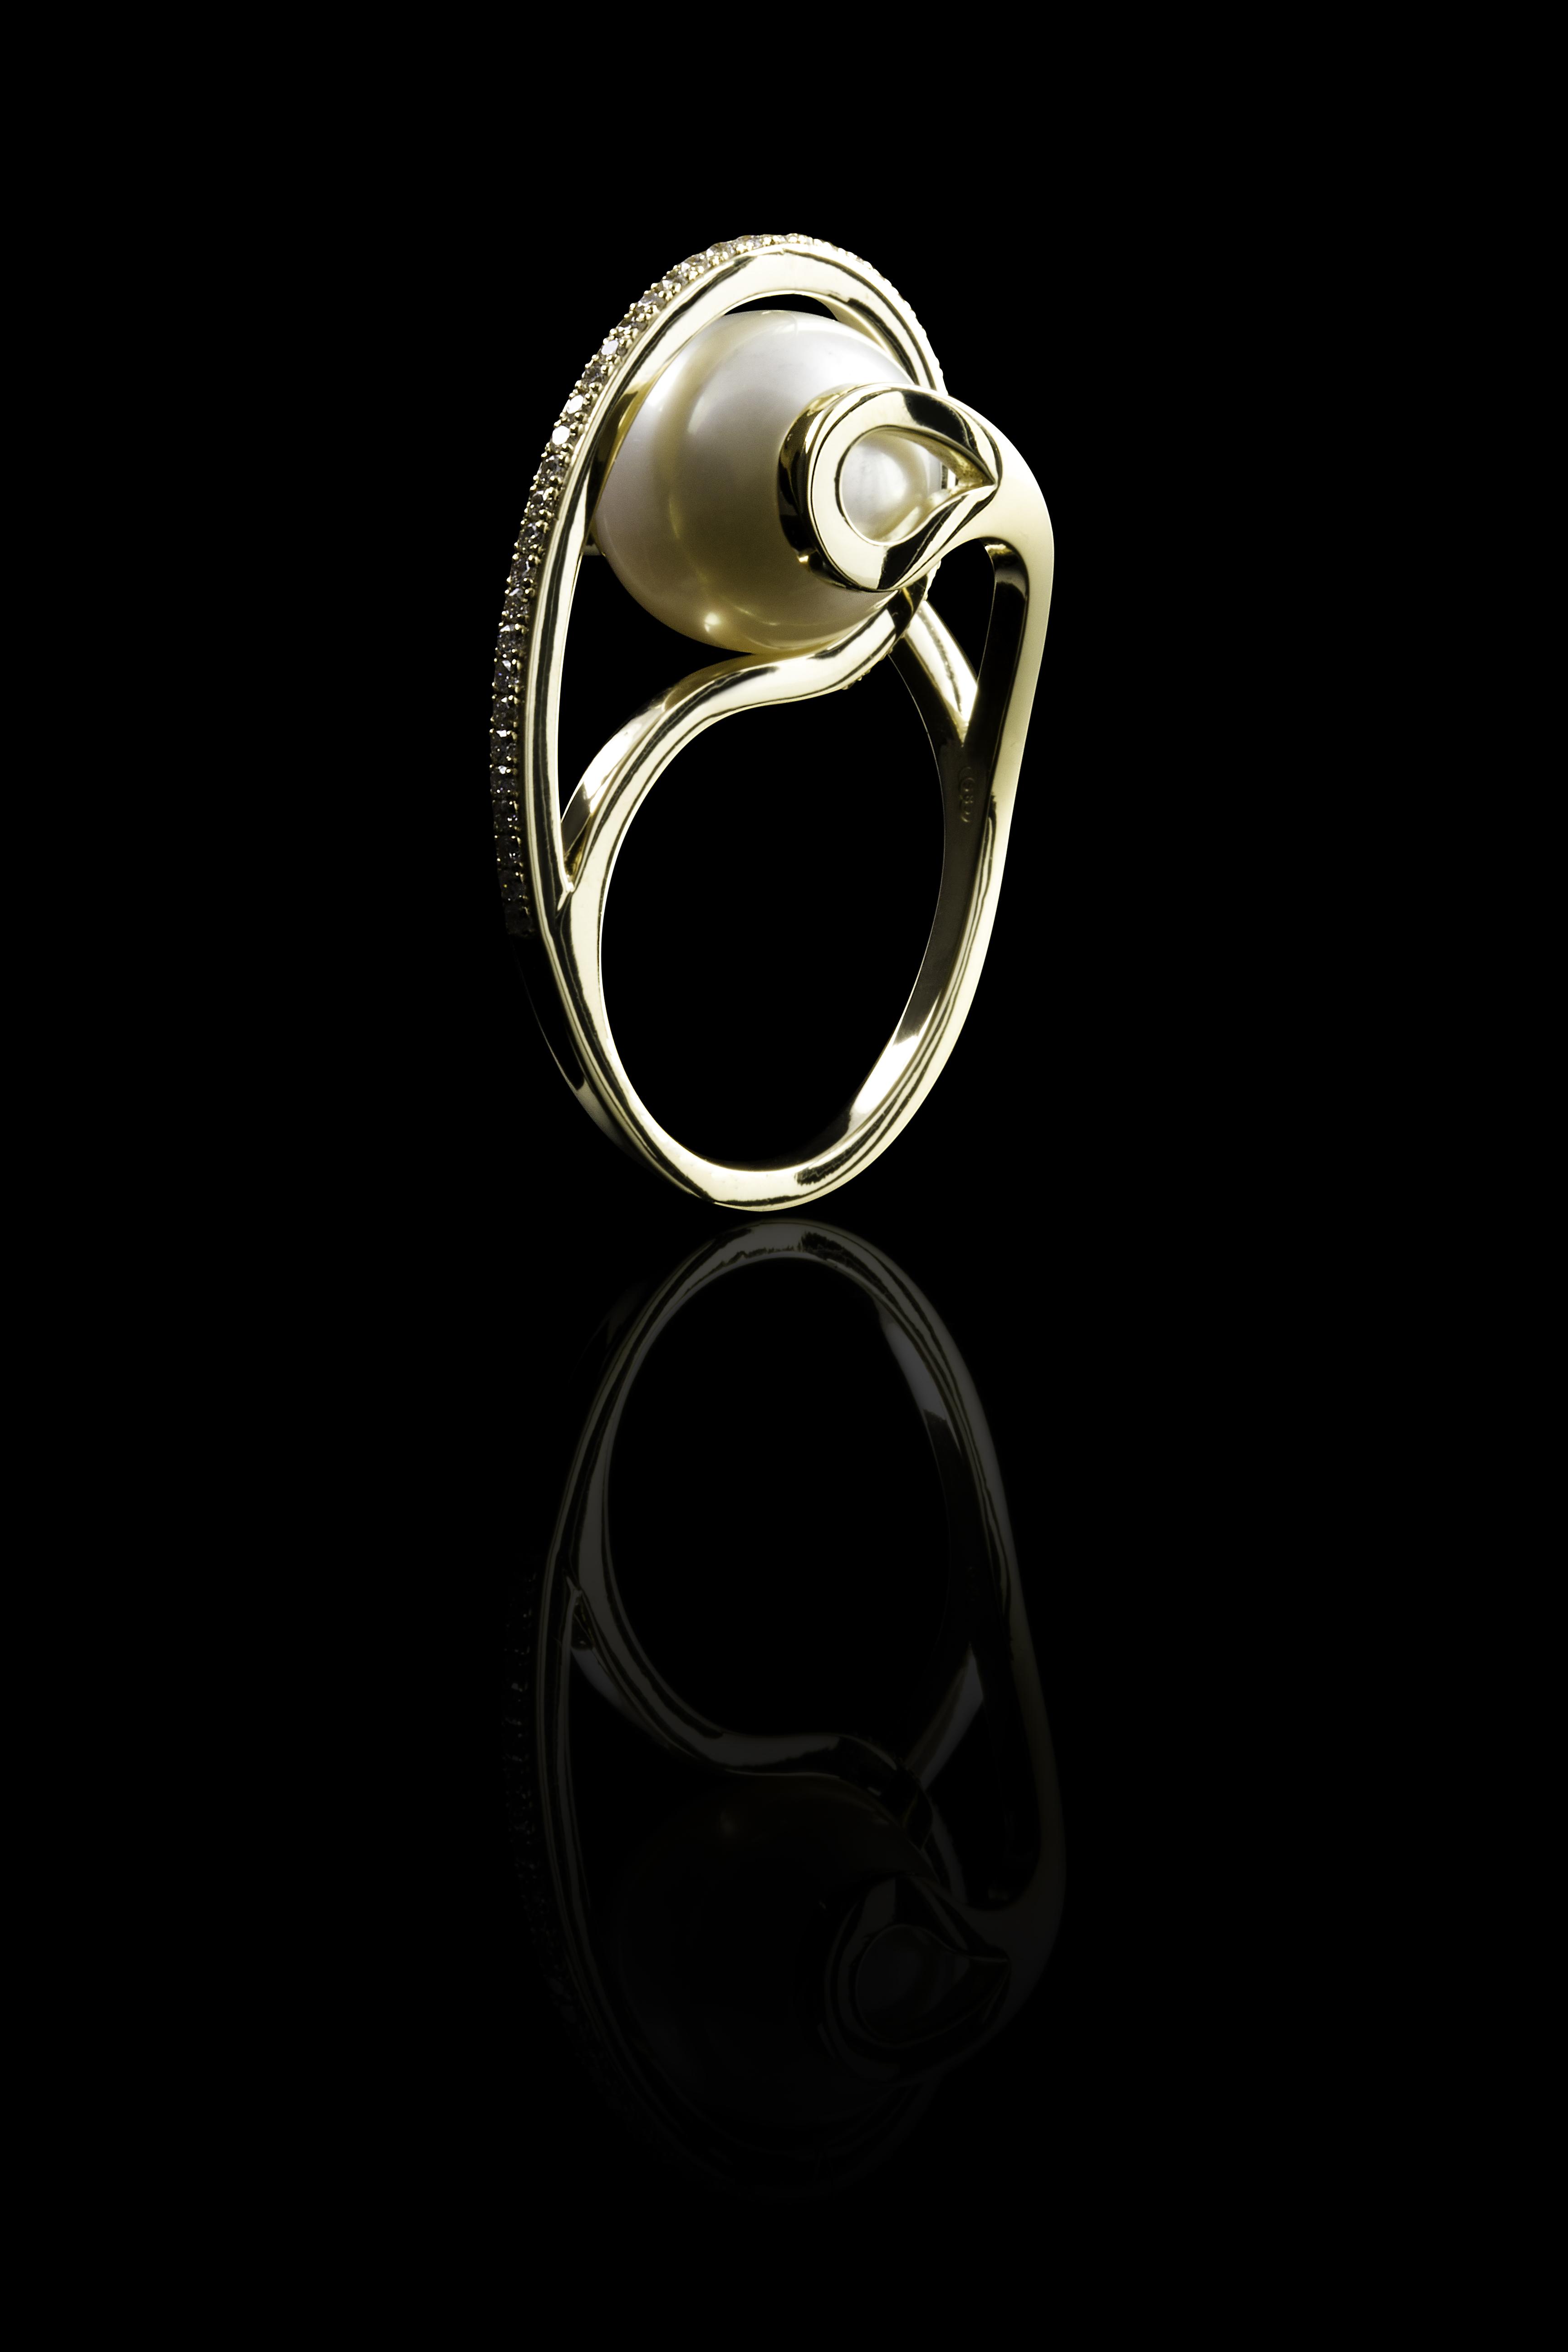 Jewellery by Alister Yiap